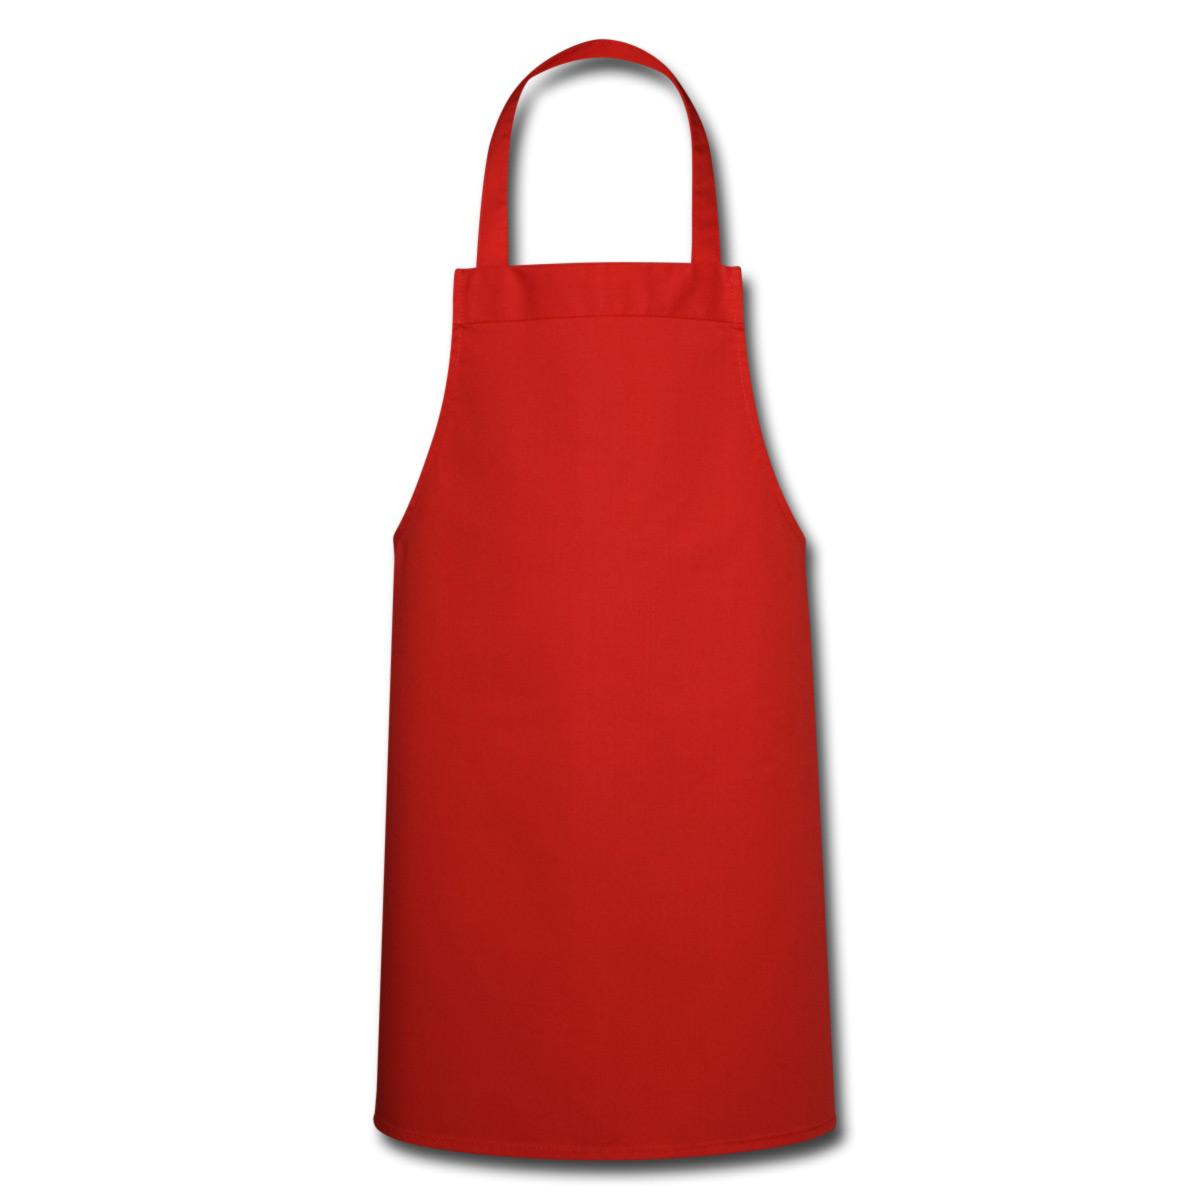 Kochschurzen Bedrucken Kochschurze Selbst Gestalten